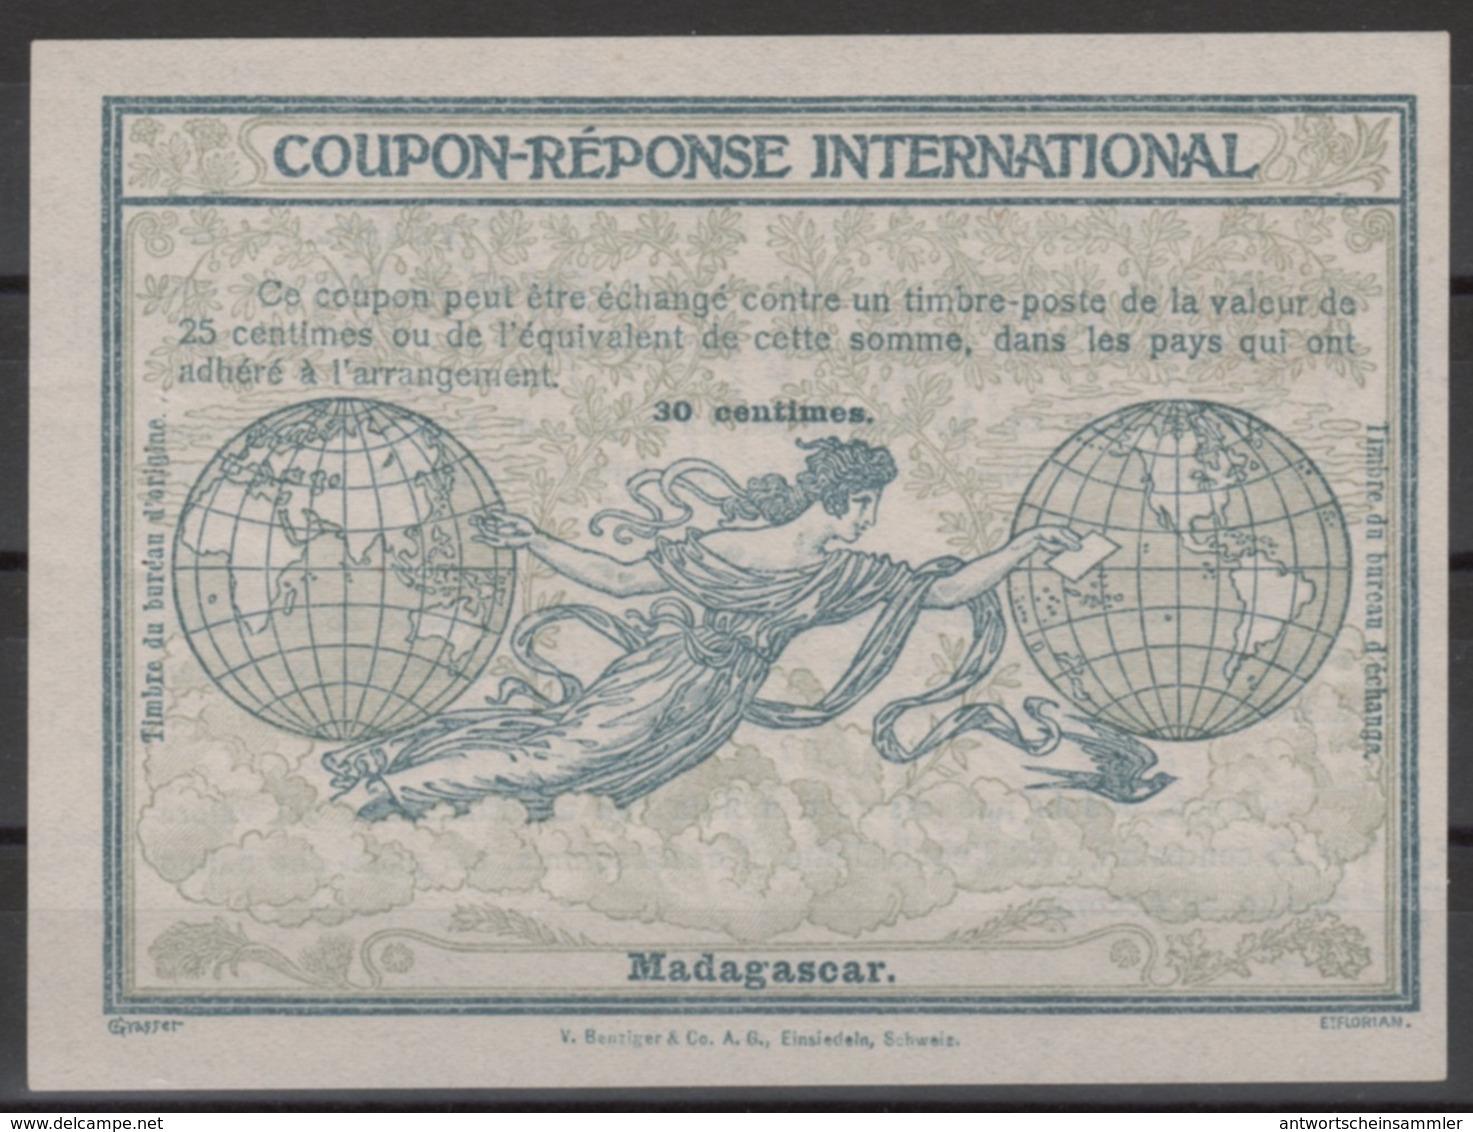 MADAGASCAR 1910, FirstRome Type Ro430 Centimes International Reply Coupon Reponse Antwortschein IAS IRC  Mint ** - Madagascar (1889-1960)